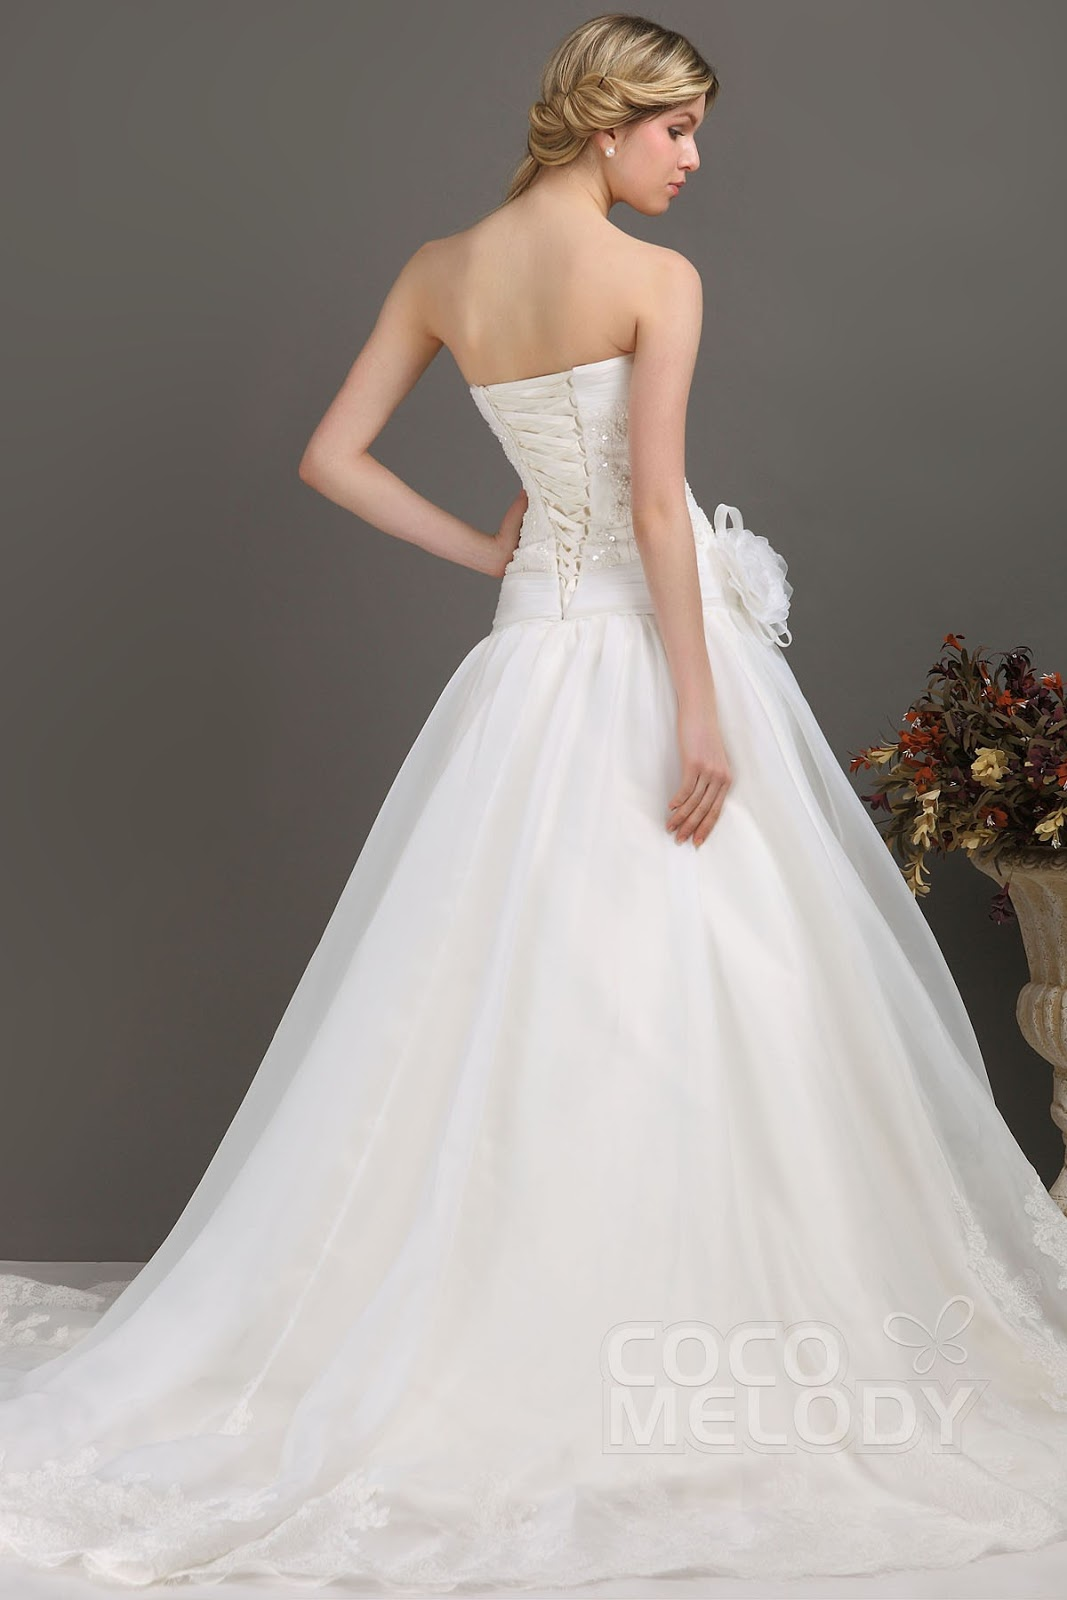 princessgorgeousweddingdress: Selecting wedding dresses for anyone ...